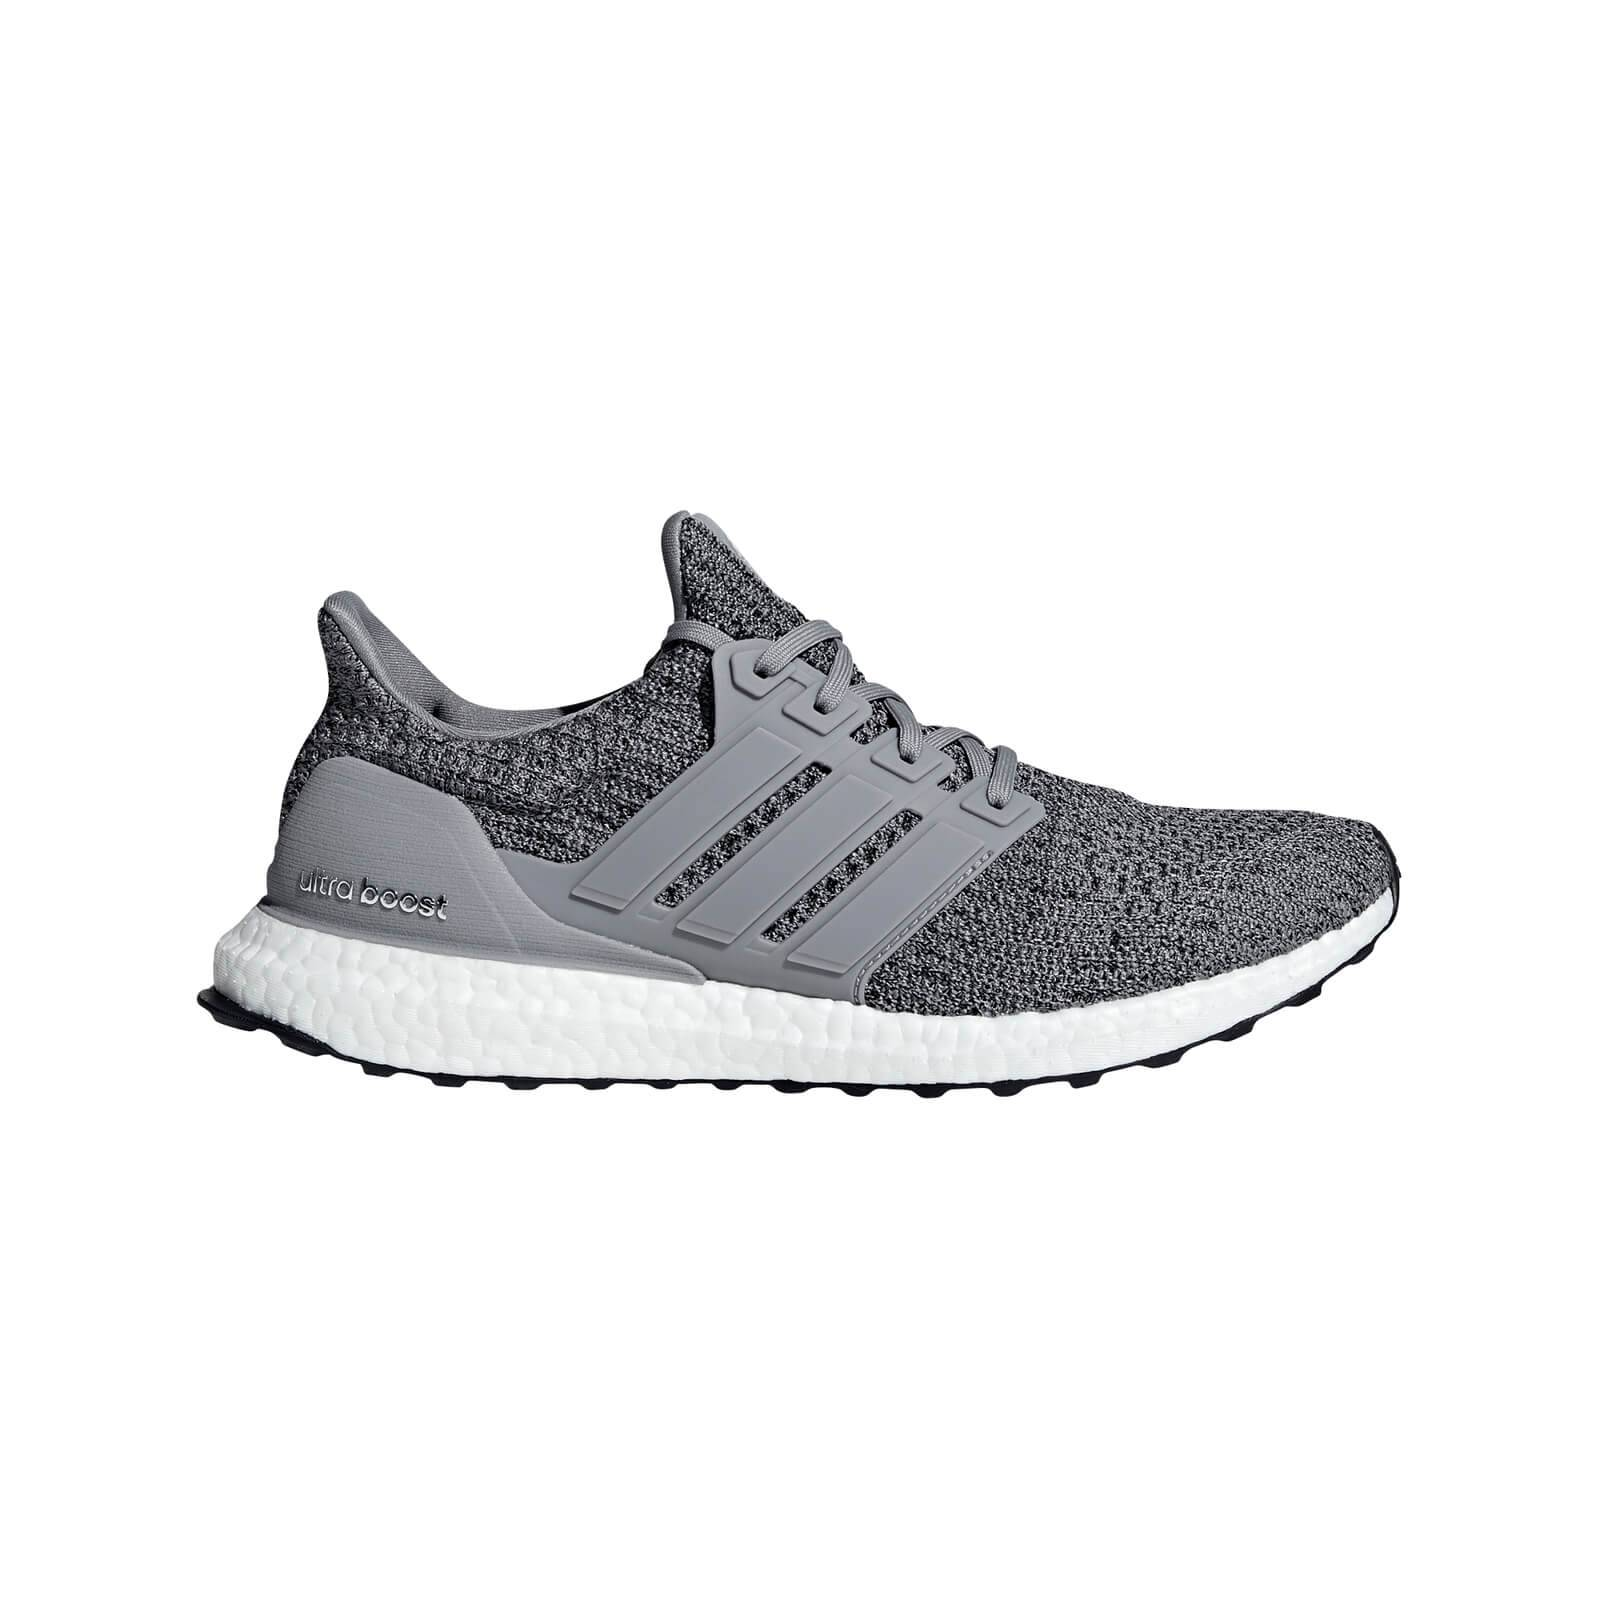 c68d5d8b3ee adidas Men s Ultraboost Running Shoes - Dark Grey Three - US 12.5 UK 12 -